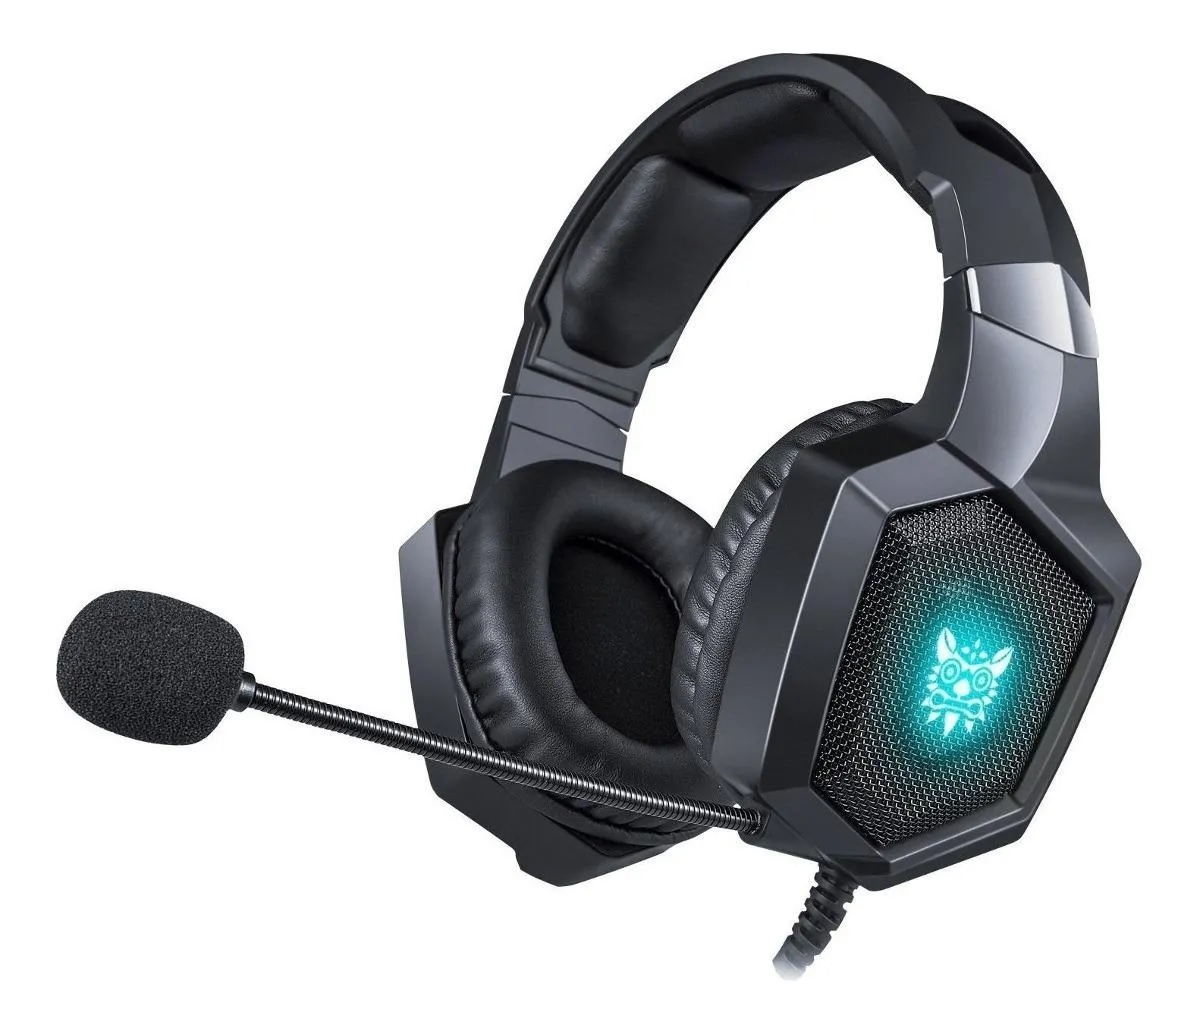 Fone de ouvido Headset Gamer Onikuma K8 RGB Microfone Ps4/X-one Celular